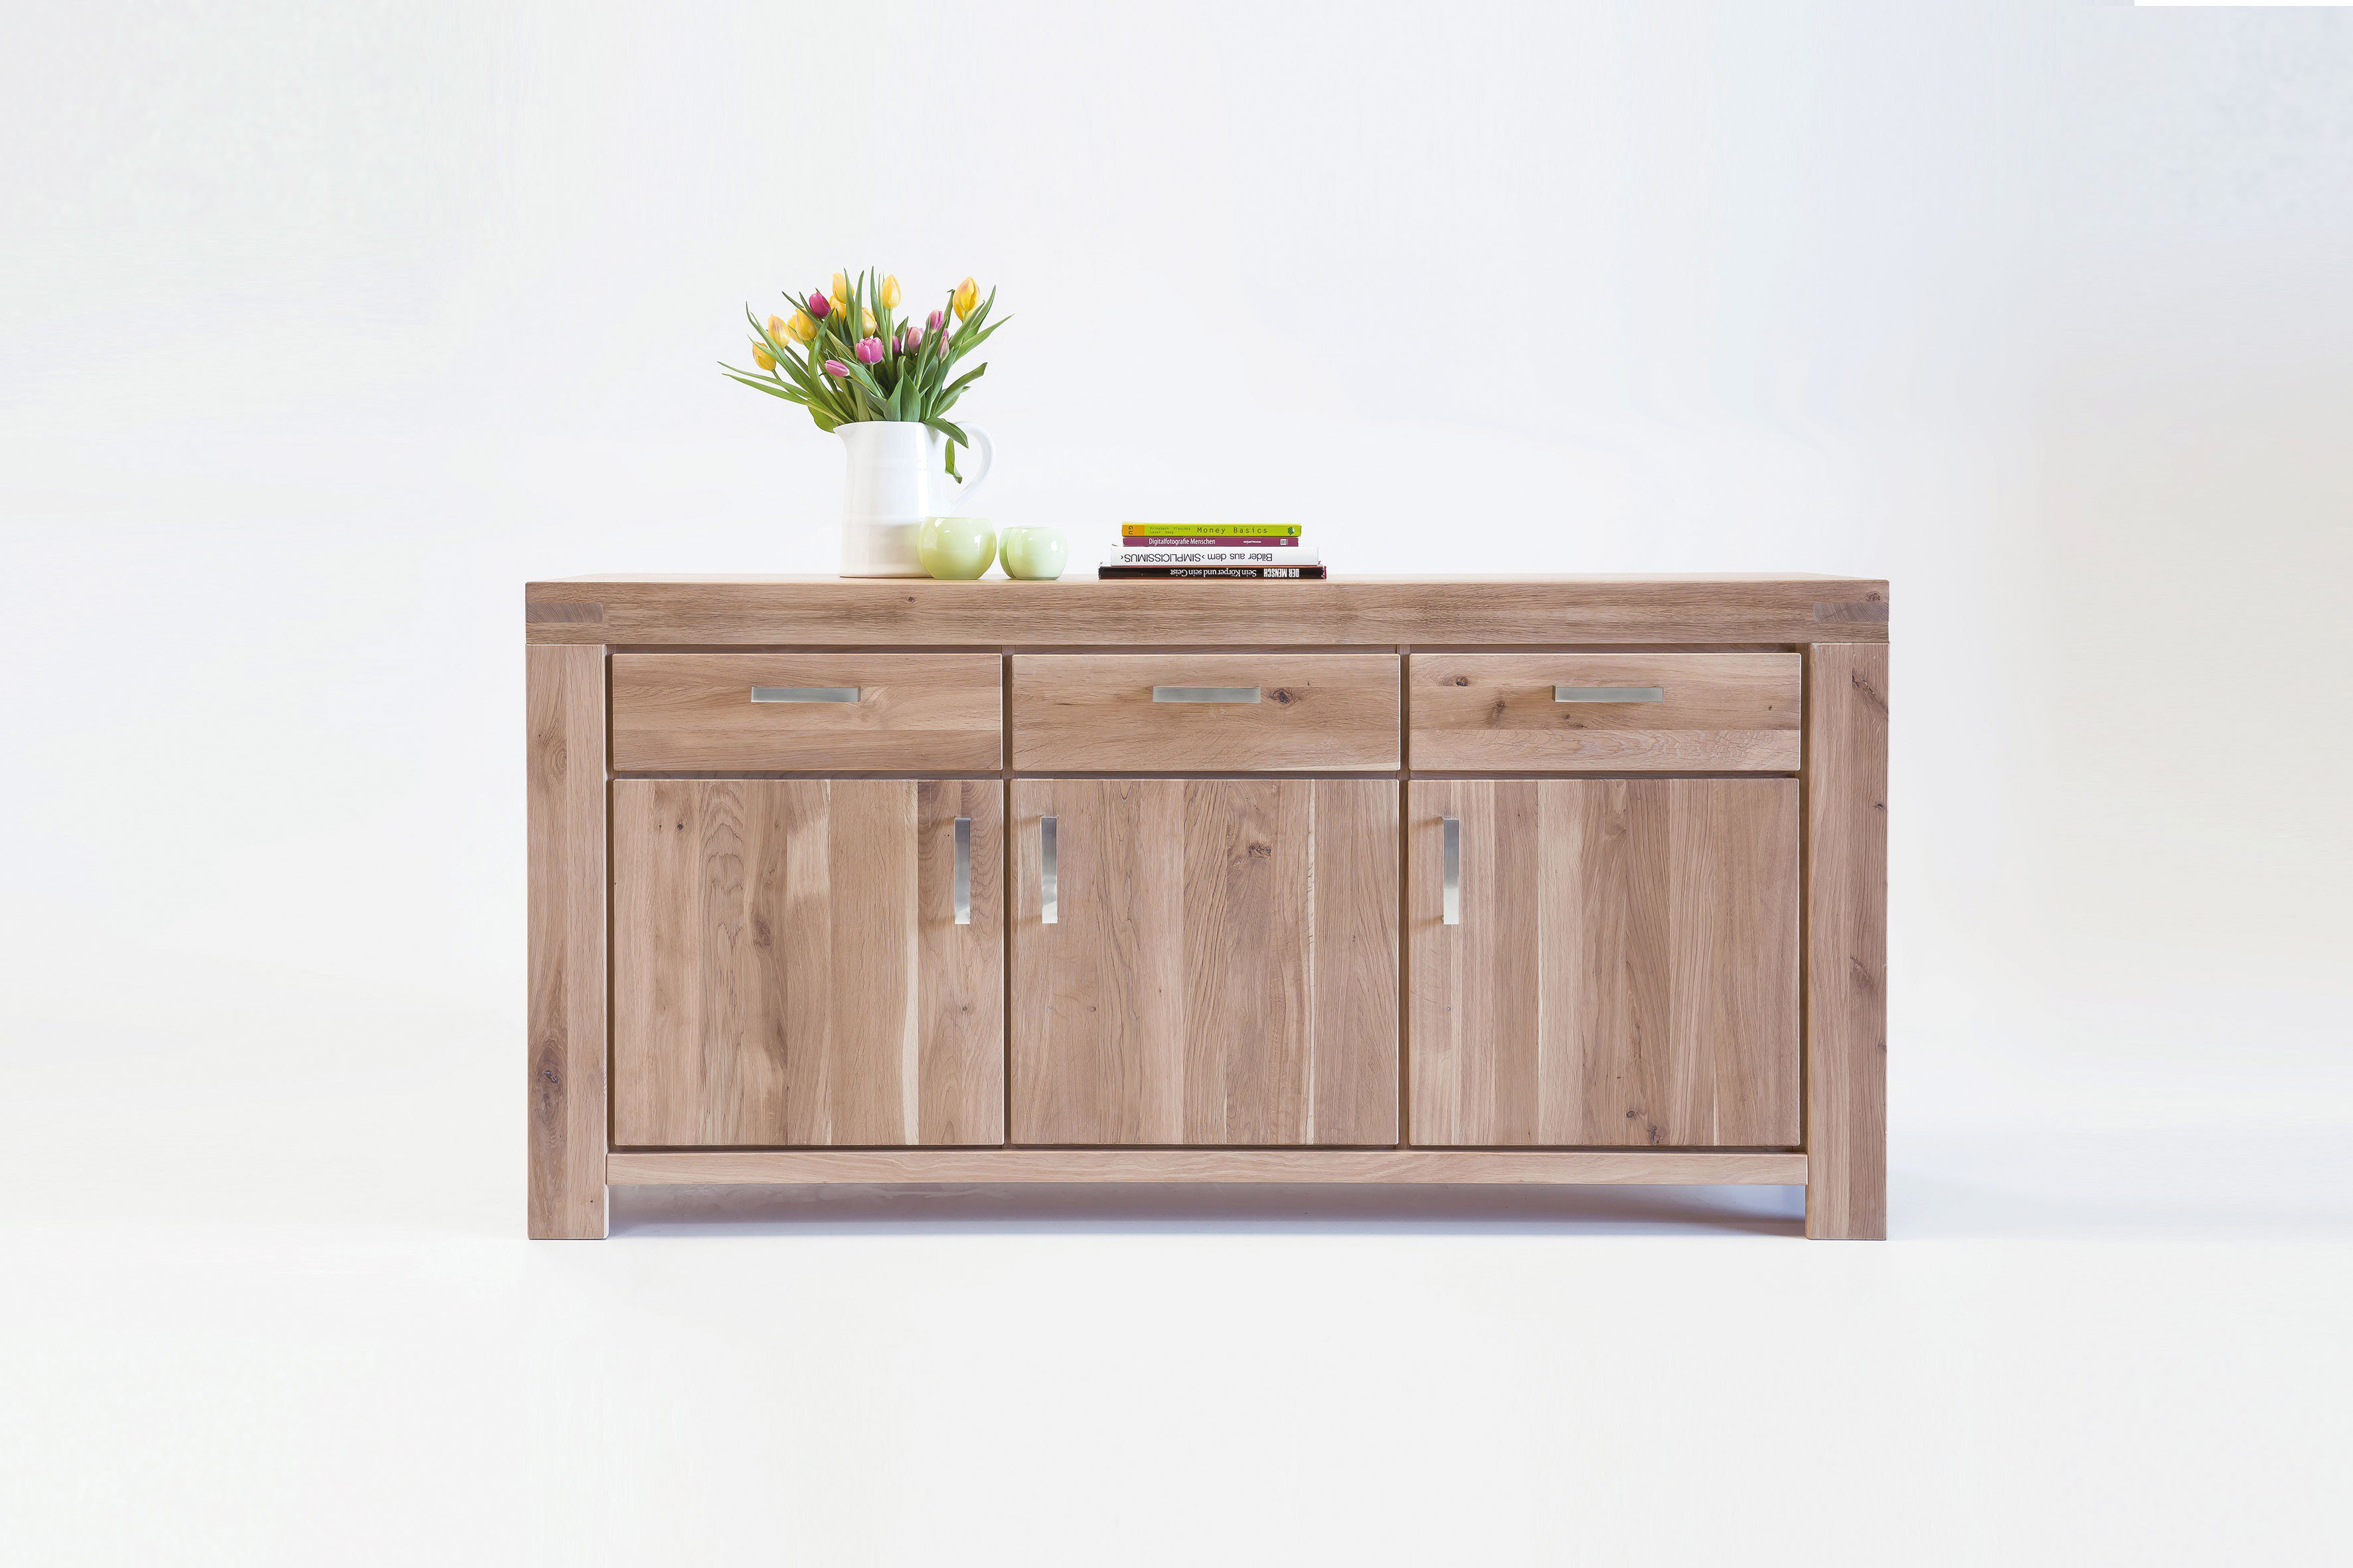 elfo m bel sideboard kira massive wildeiche bianco. Black Bedroom Furniture Sets. Home Design Ideas